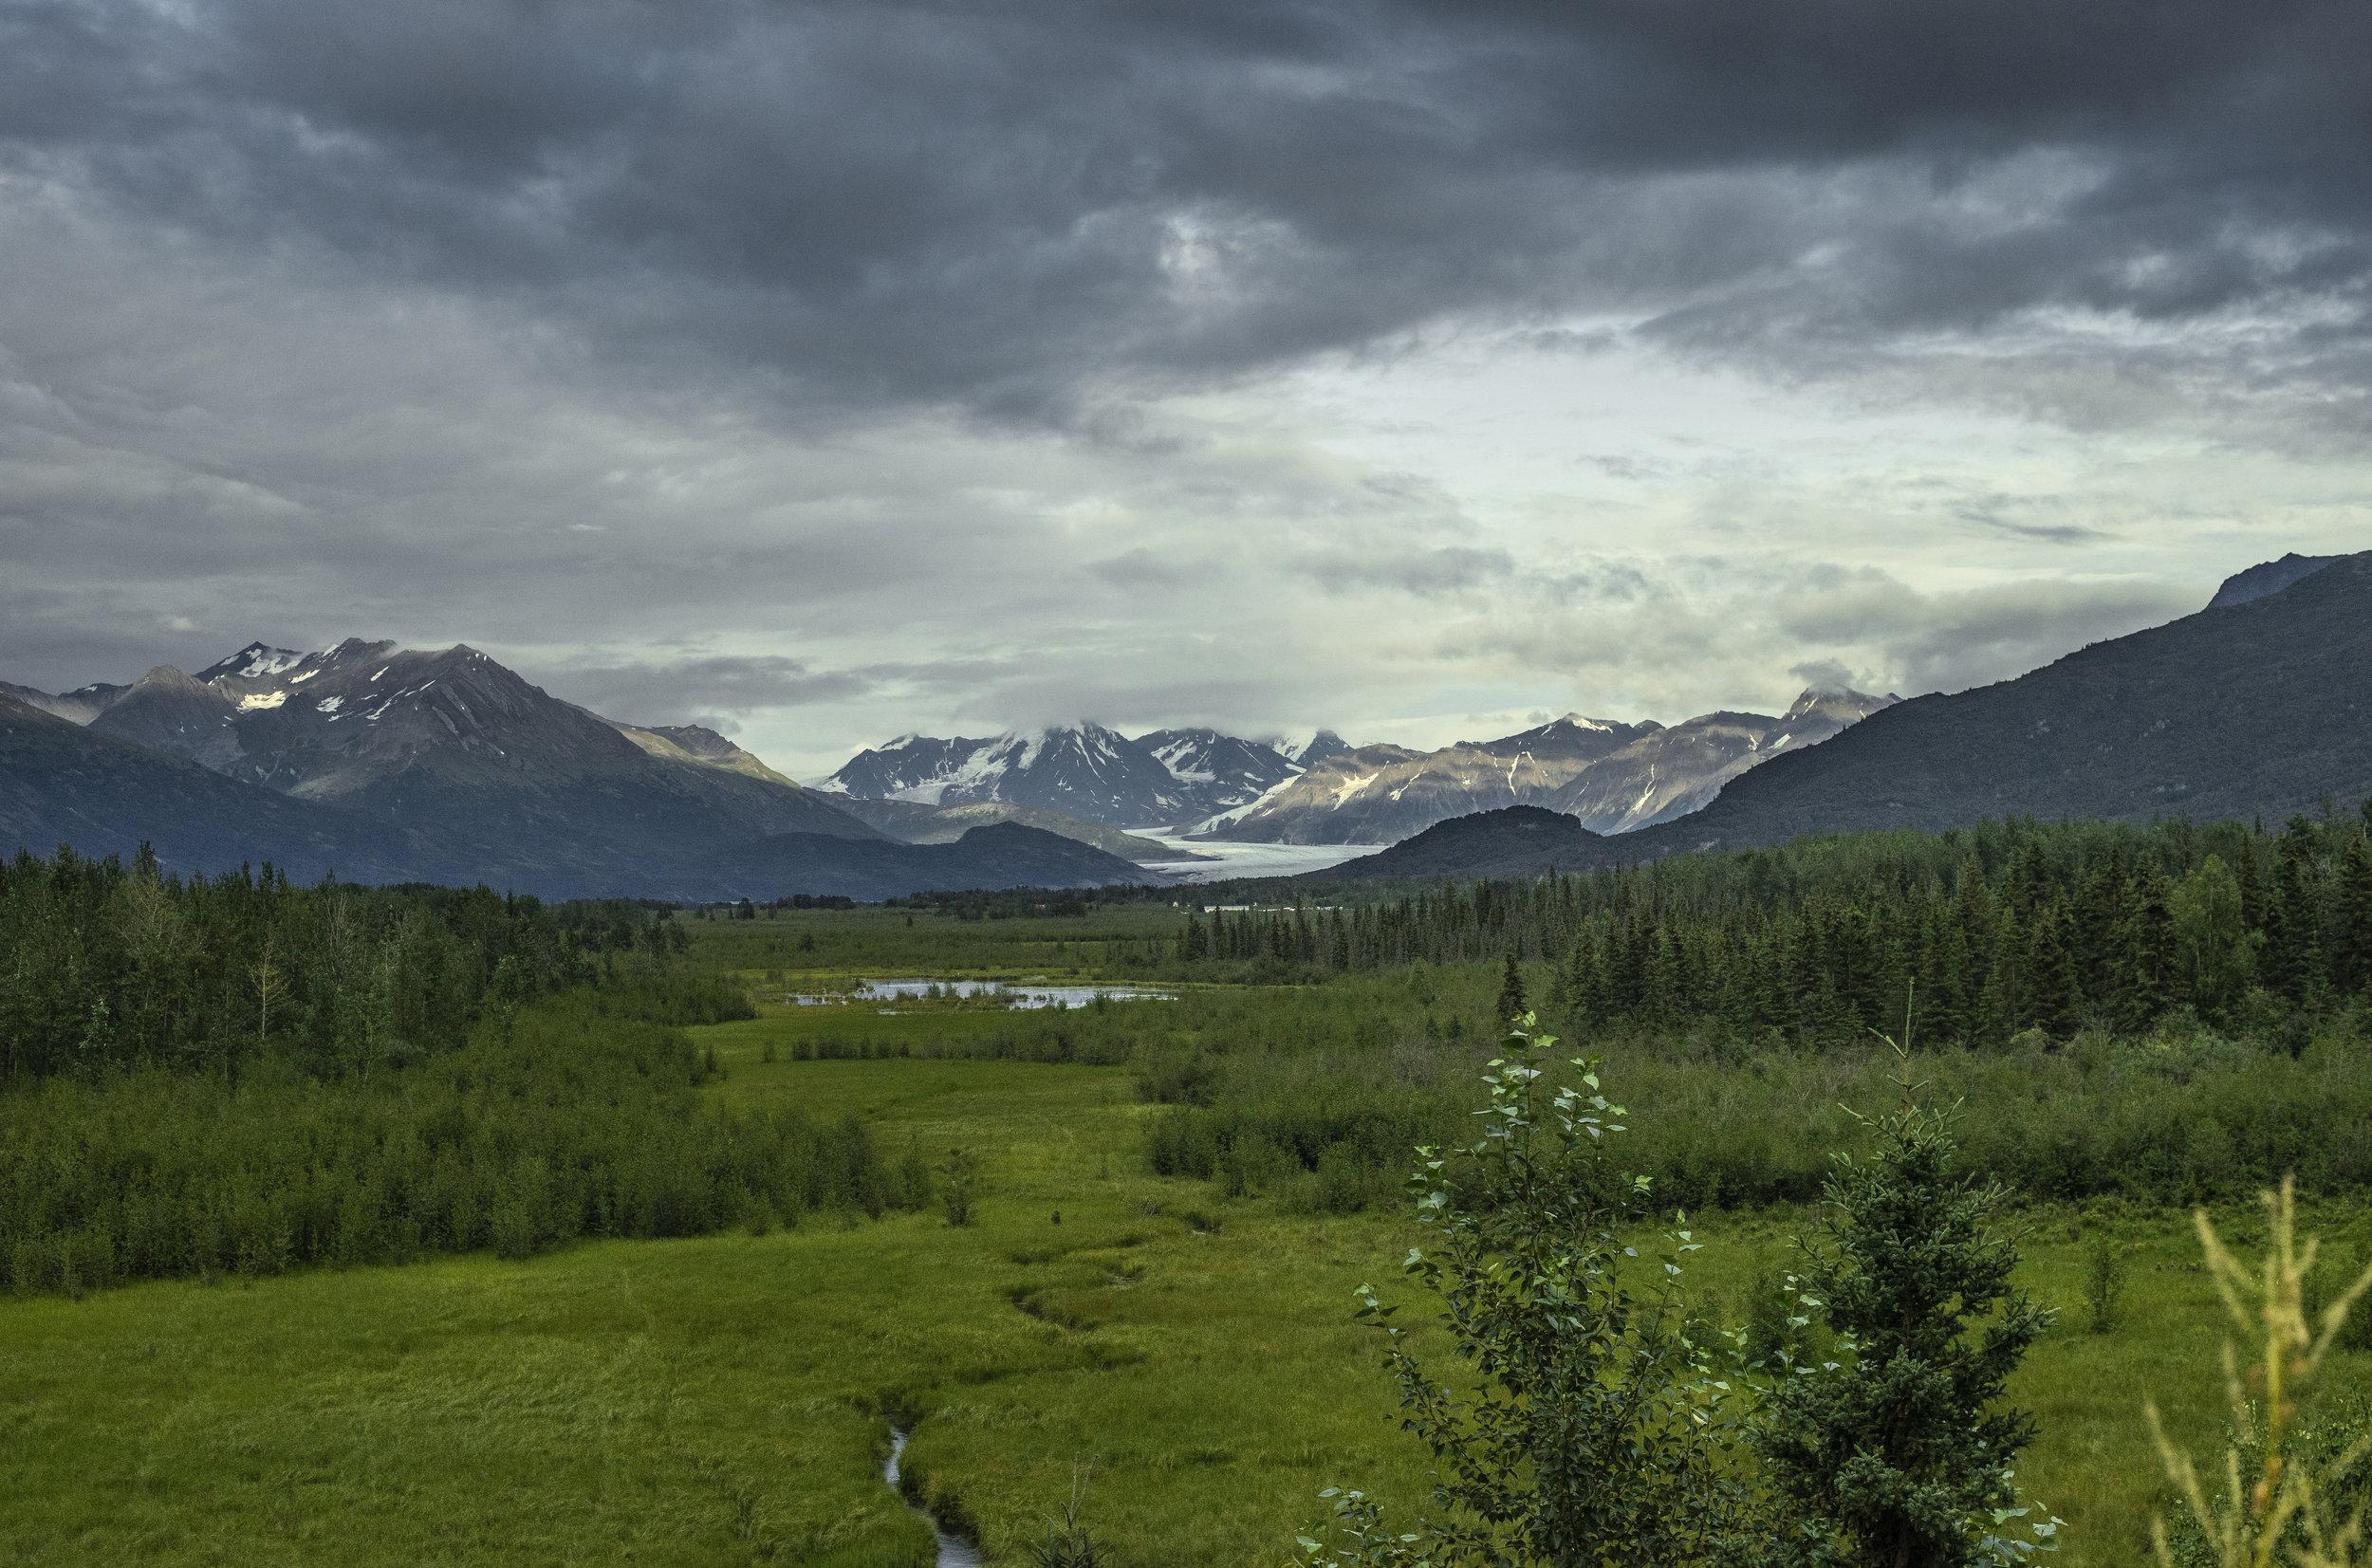 Knik Glacier, Alaska, July 2019